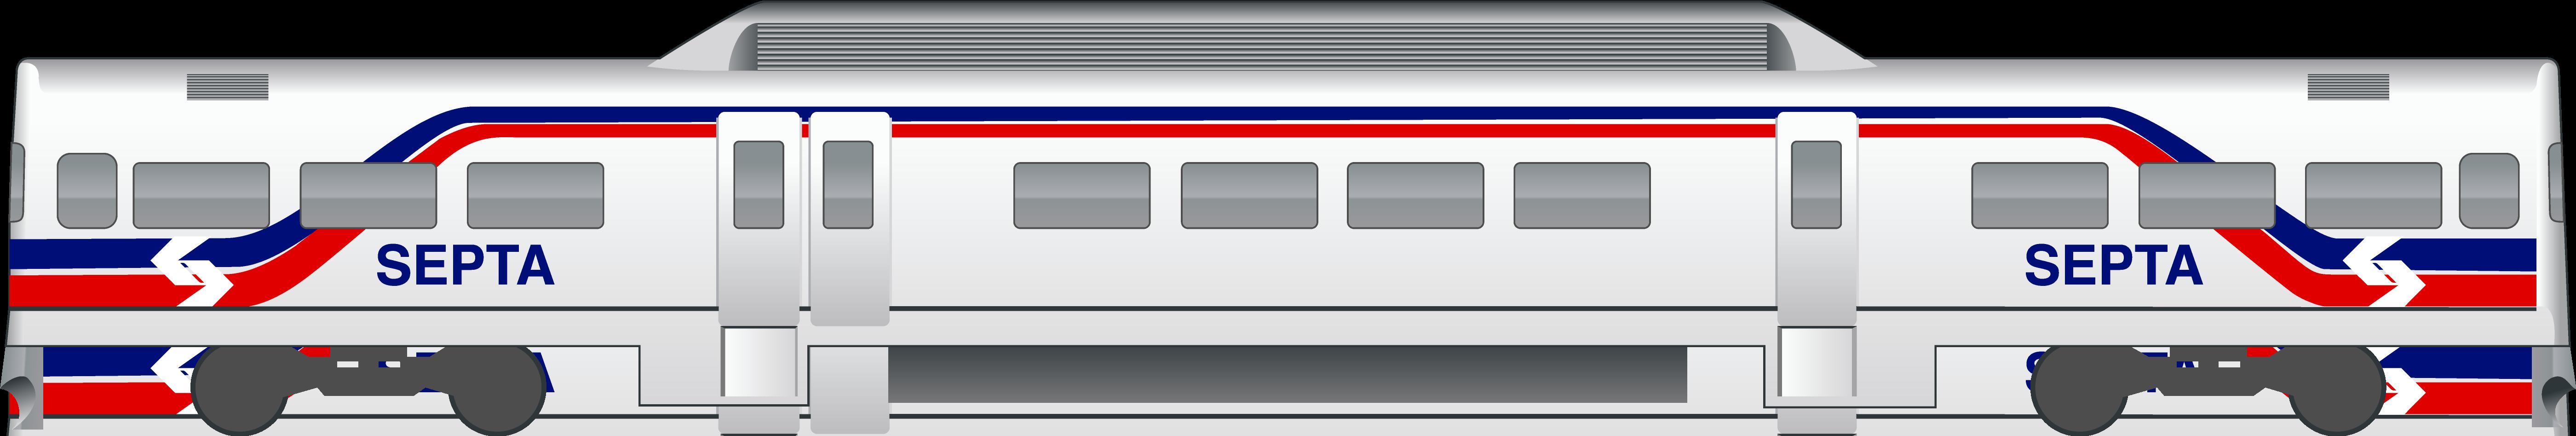 Passenger train car clipart freeuse library Respect The Train | SEPTA | Southeastern Pennsylvania Transportation ... freeuse library